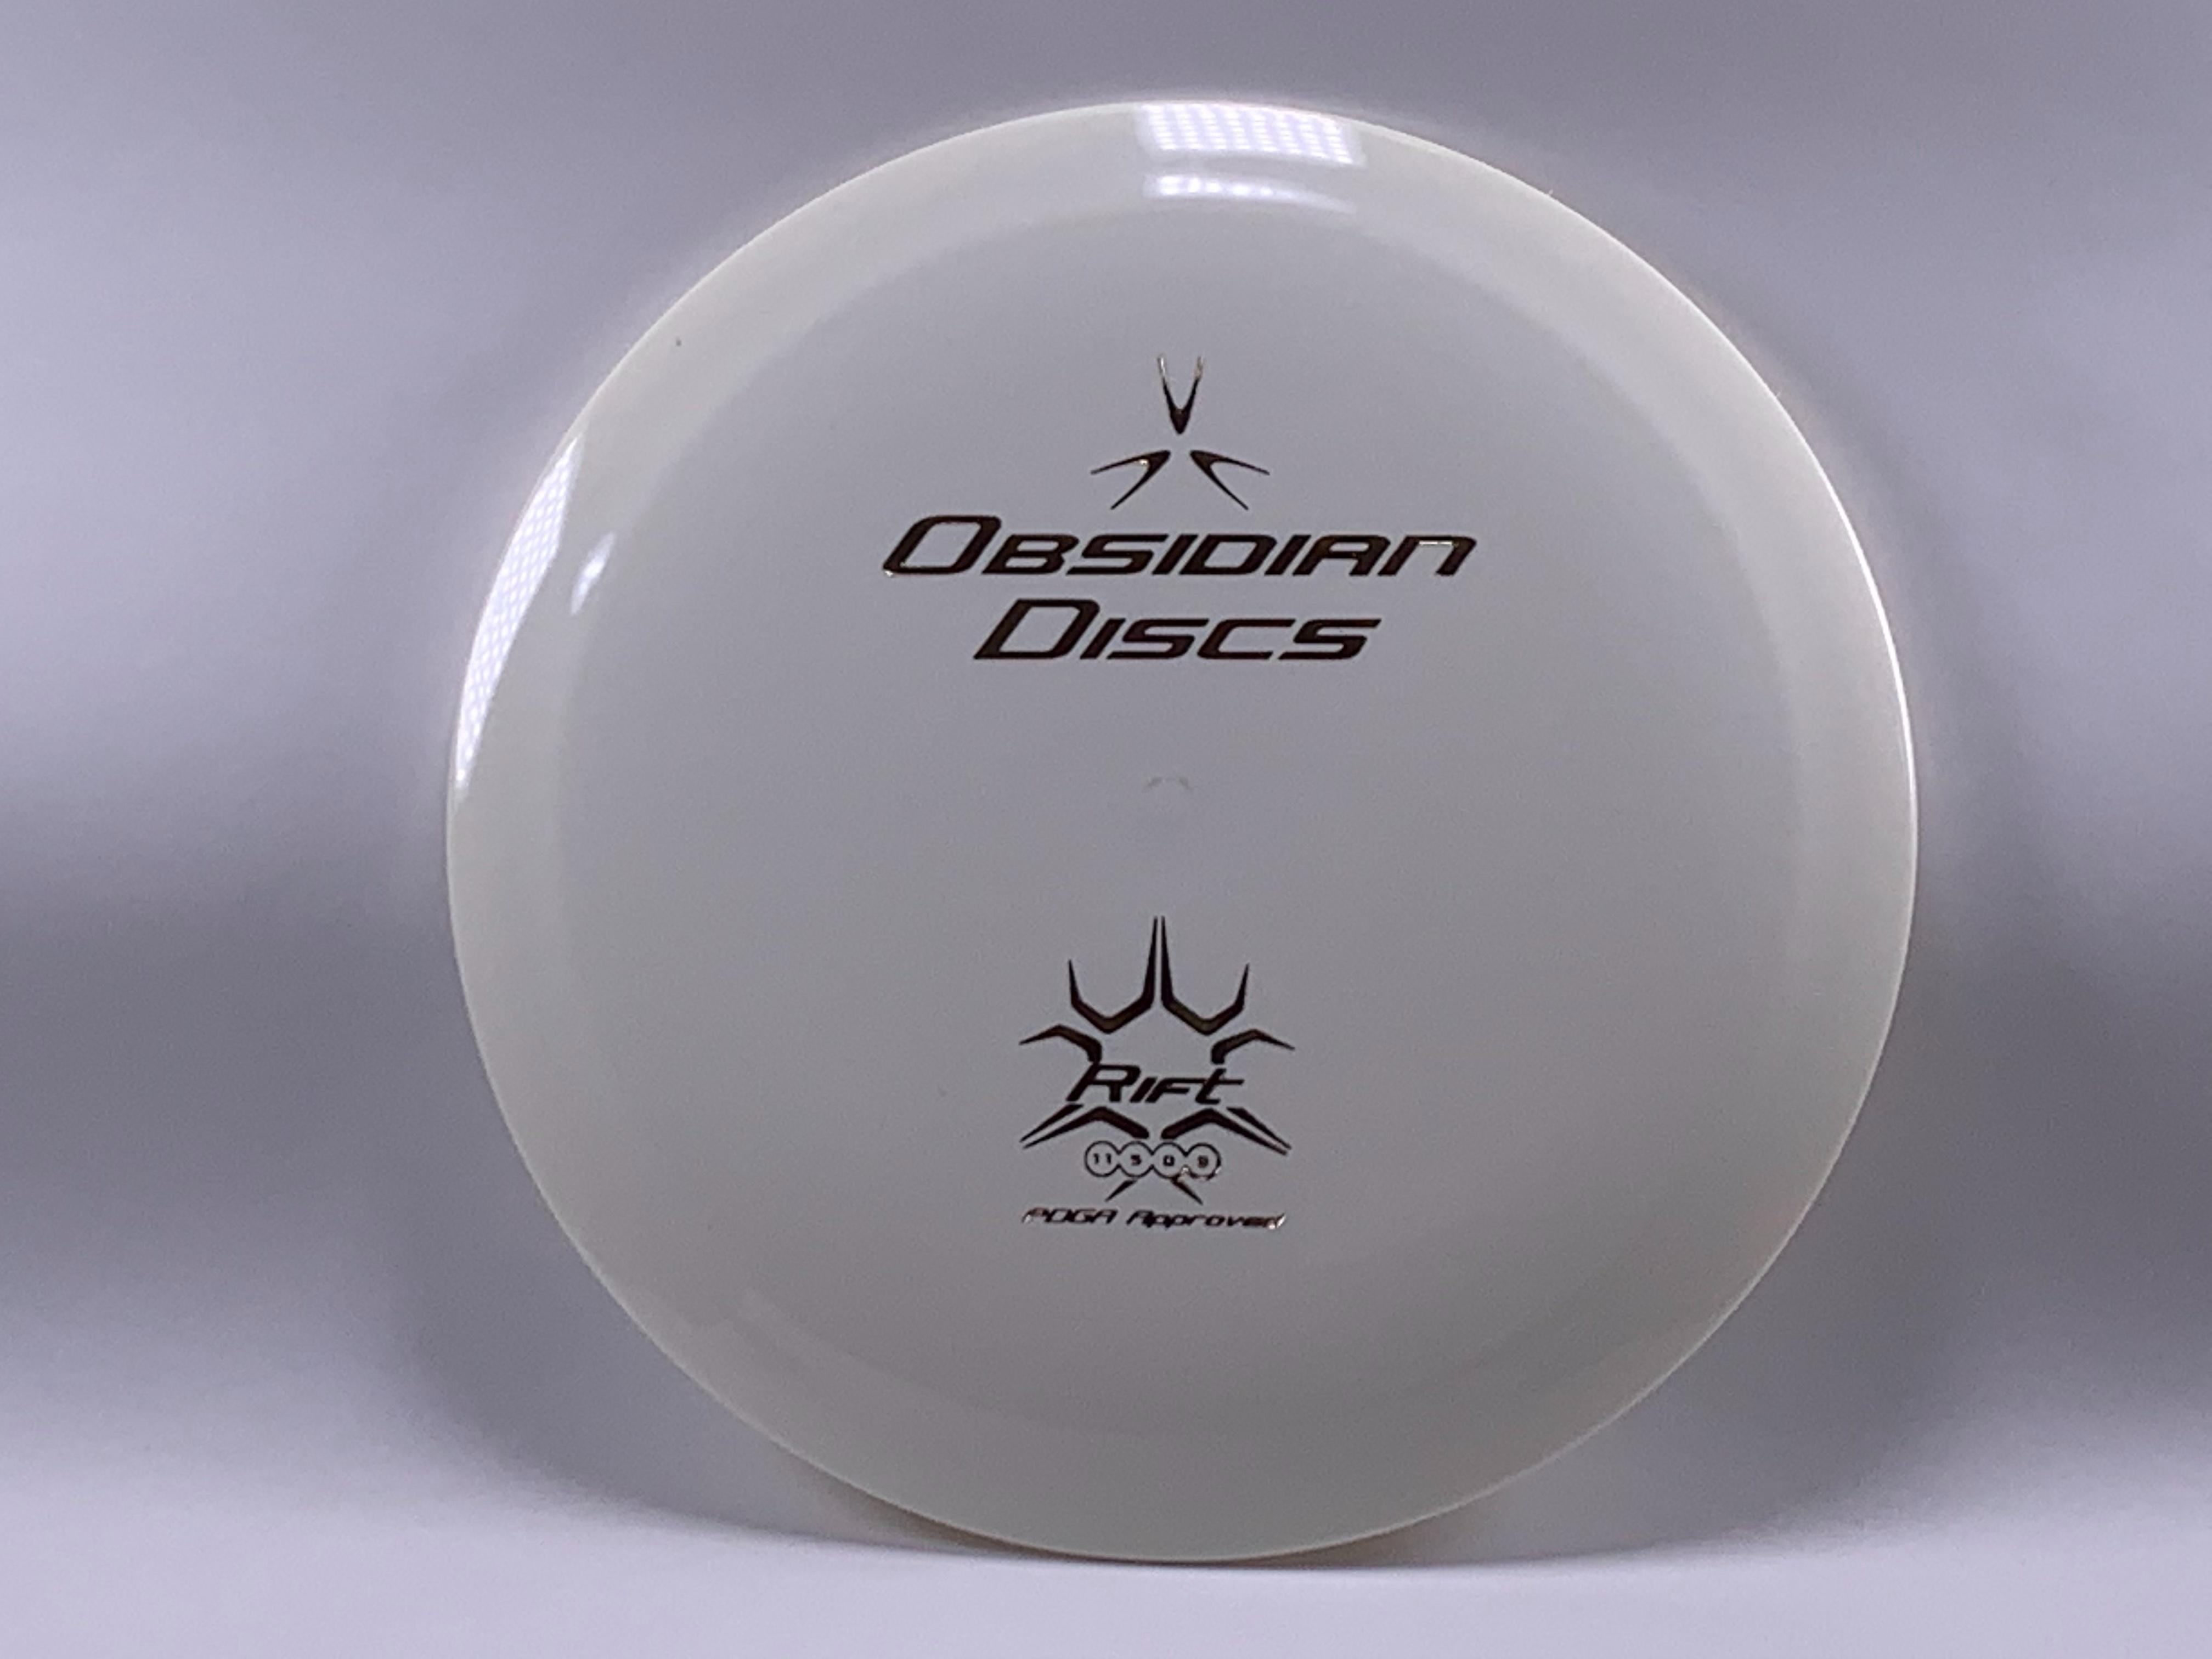 Obsidian Discs Rift